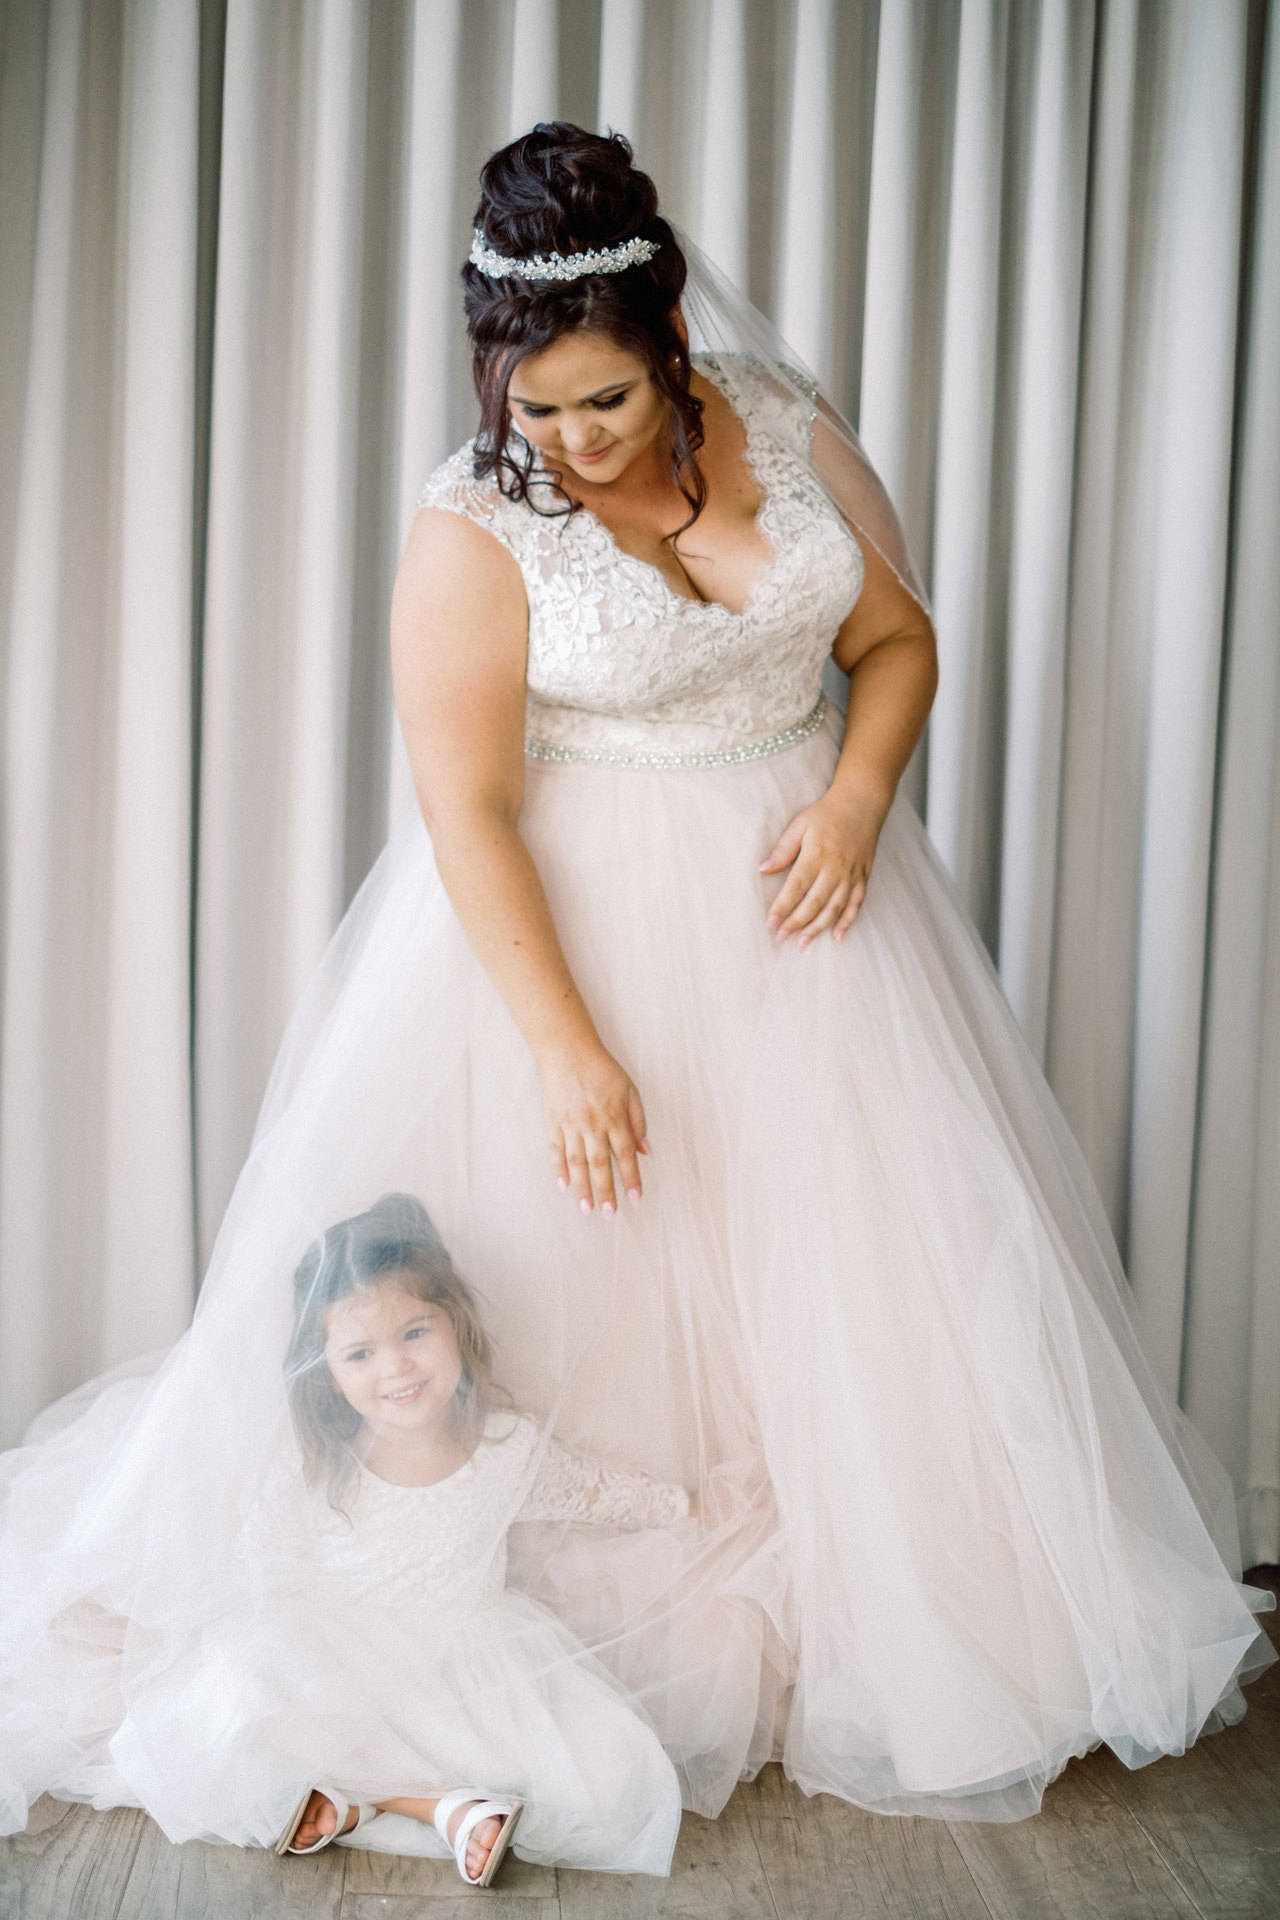 Bride and Daughter Wedding Photos Bali